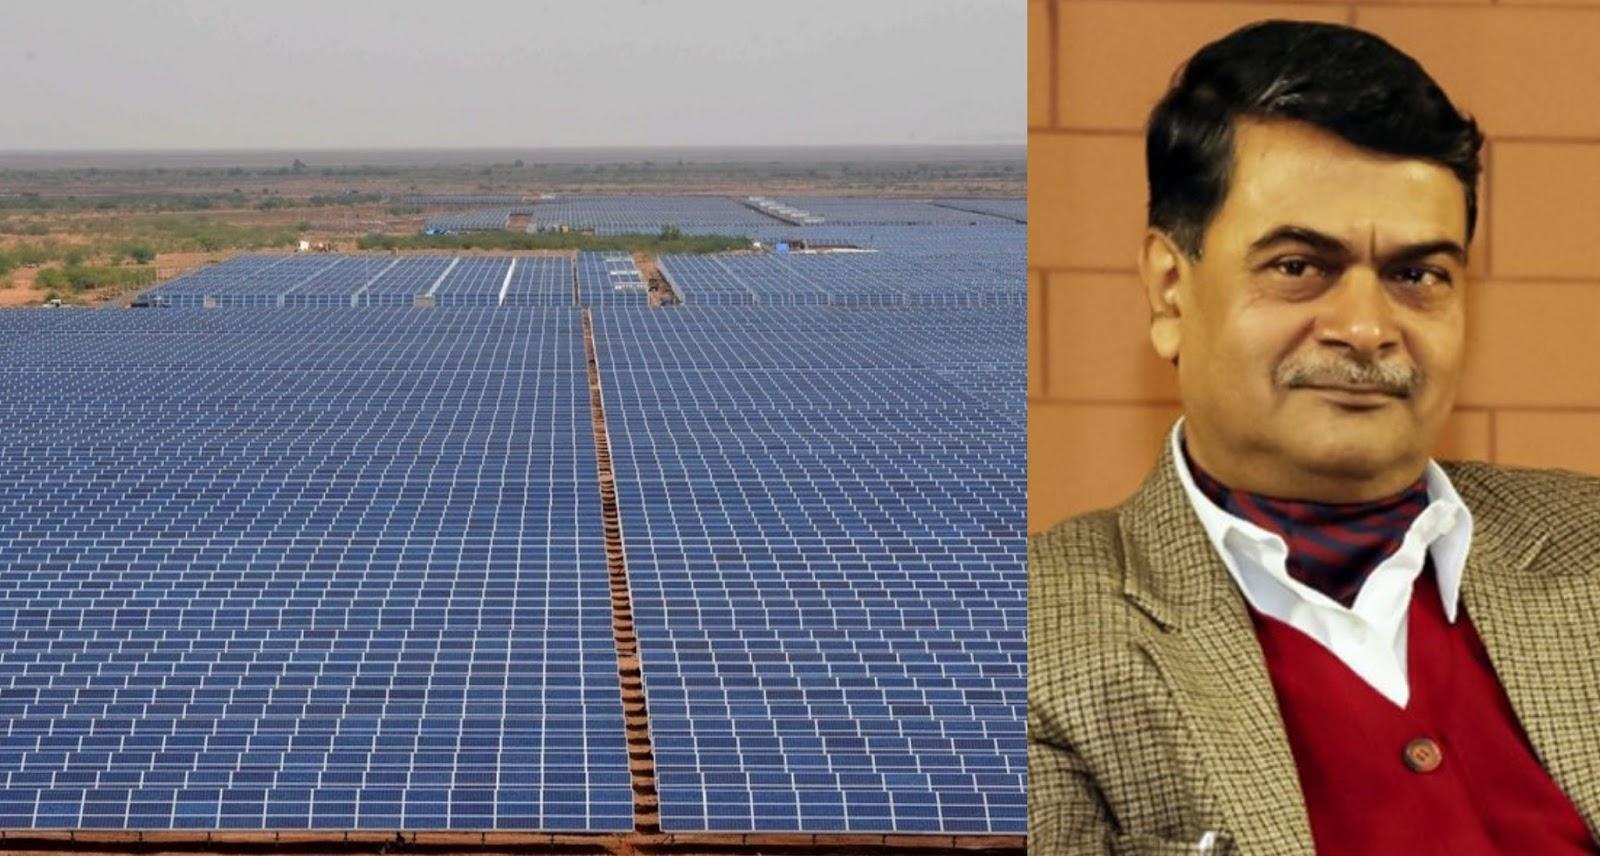 सौर ऊर्जा को बढ़ावा को सरकार कर रही काम : राज कुमार सिंह